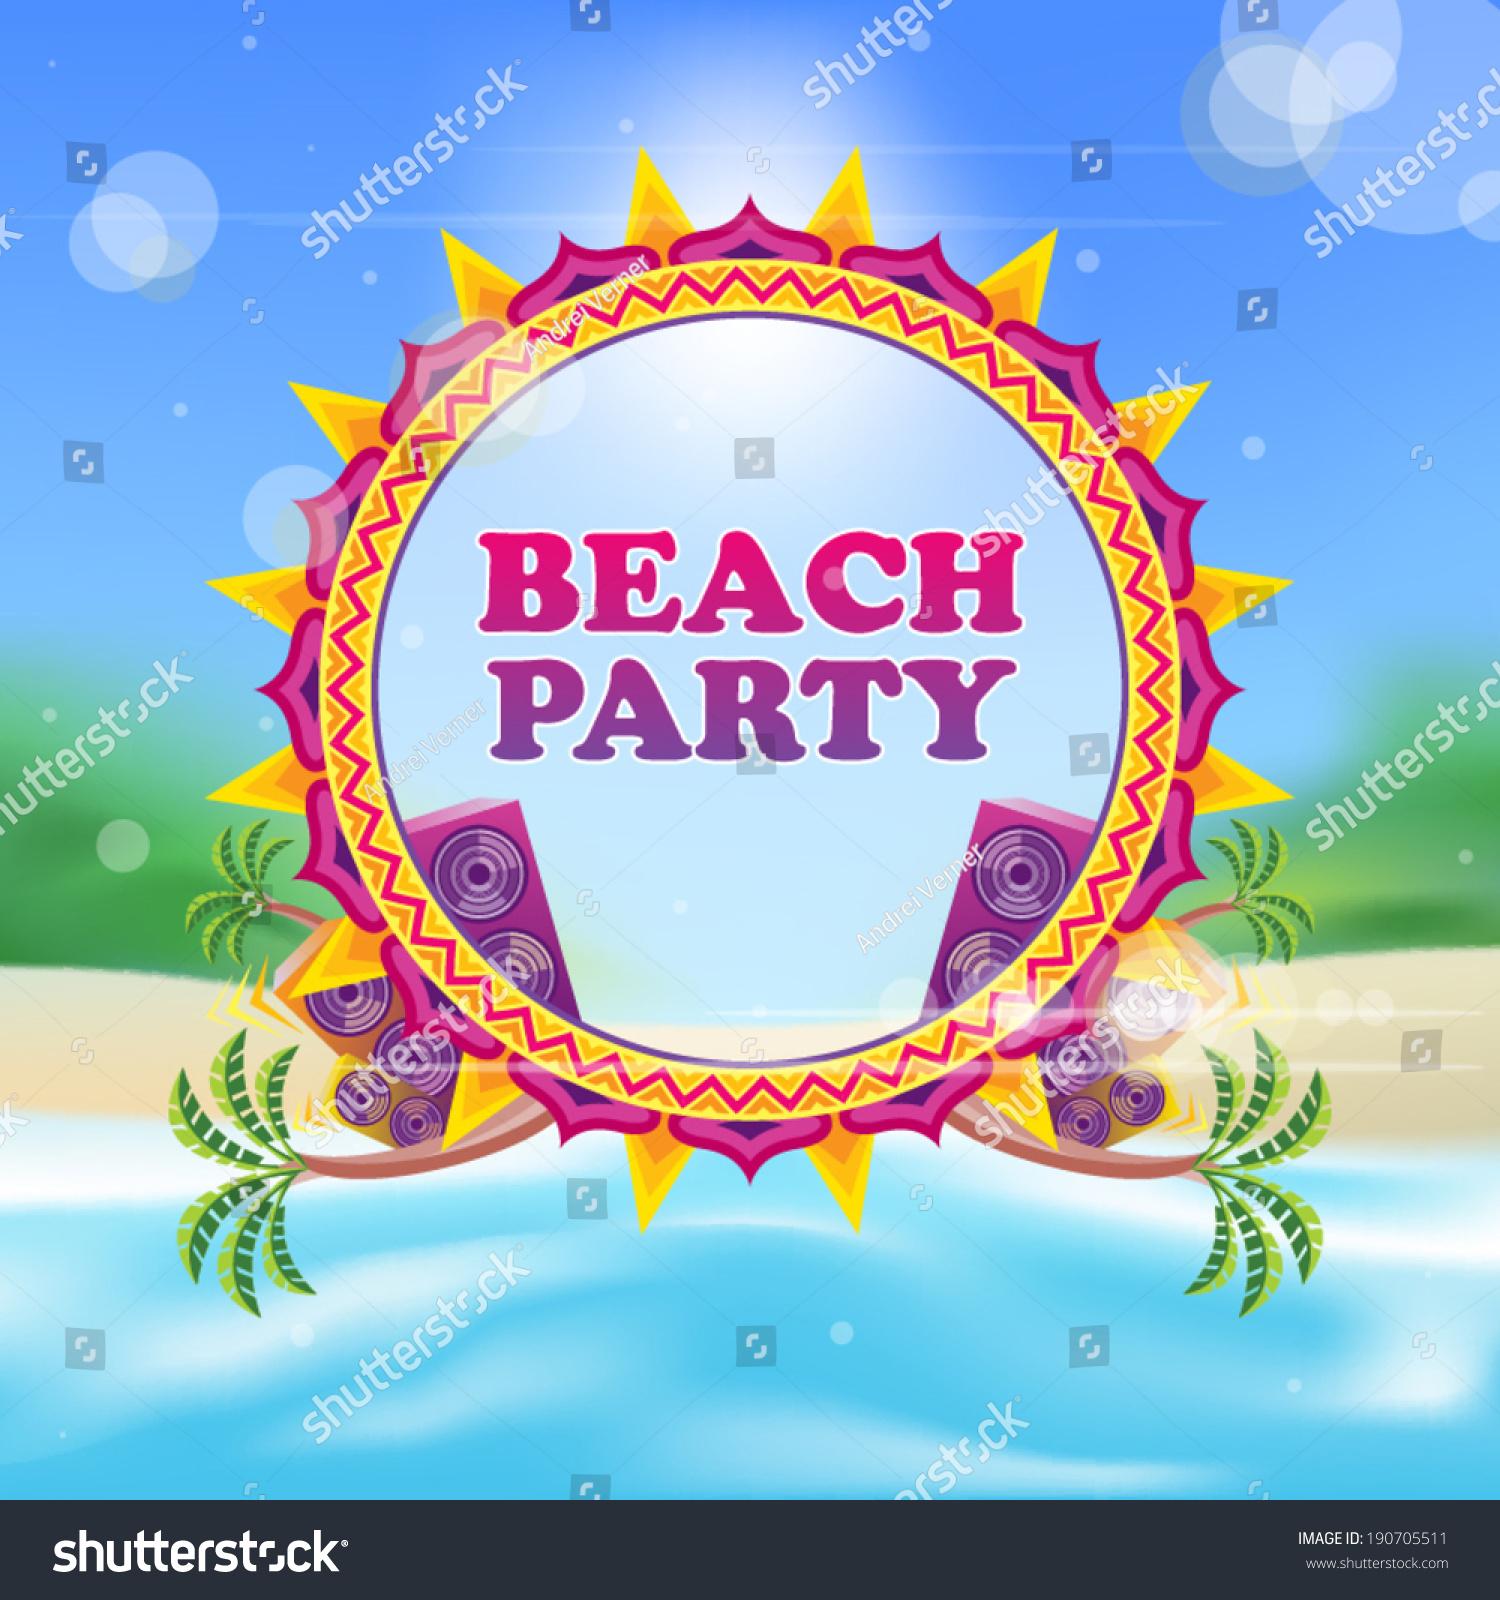 Beach Party Flyer Template Vector Illustration Stock Vector Royalty